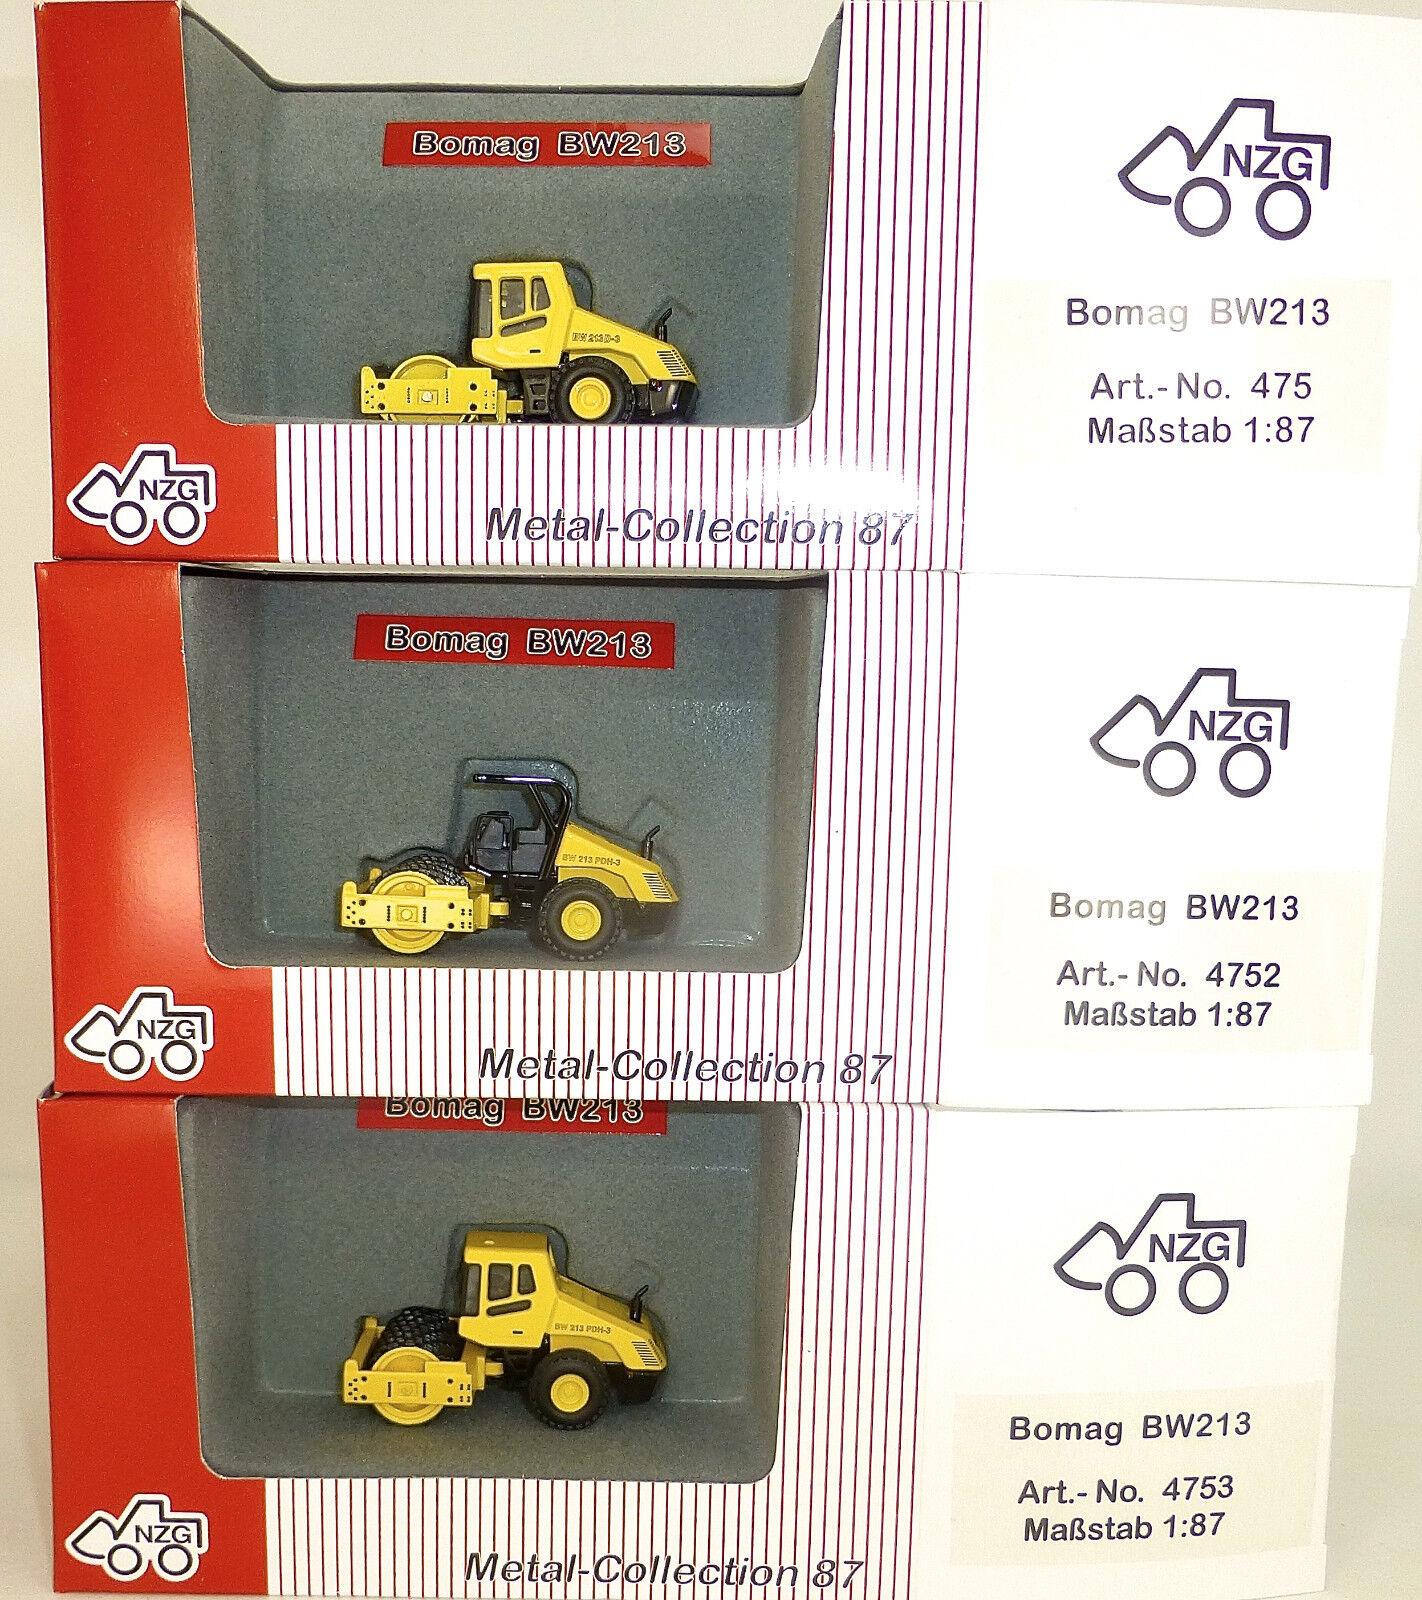 3 x Bomag Straßenwalze yellow NZG 475 4752 4753 Metall Collection 1 87 OVP µ